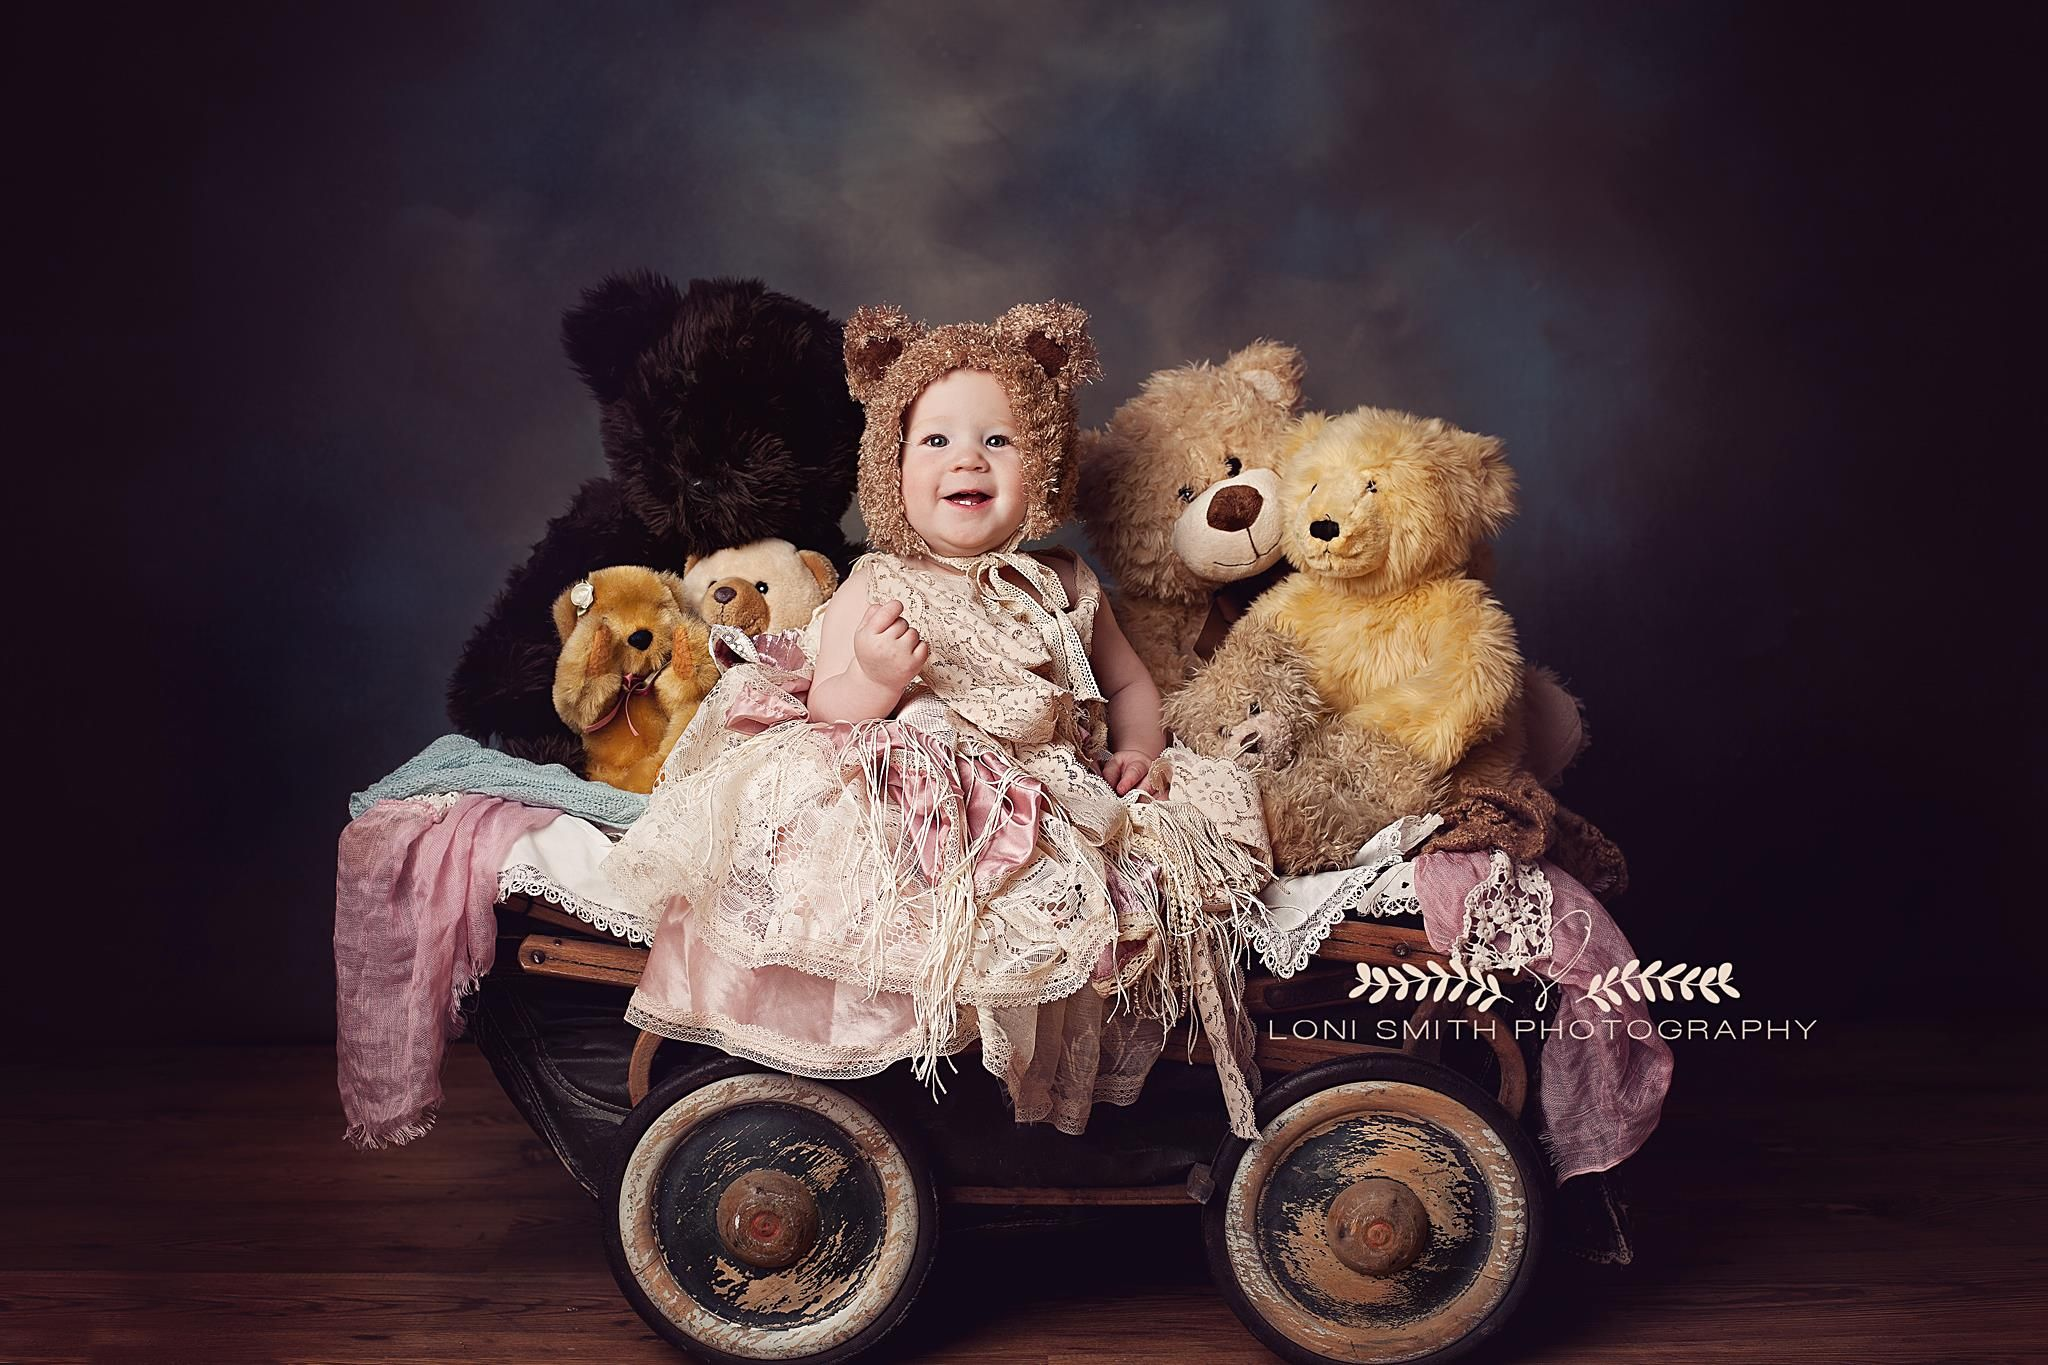 Loni Smith Photography - Utah whimsical newborn photographer, child photography, children photographer, Salt Lake photographer